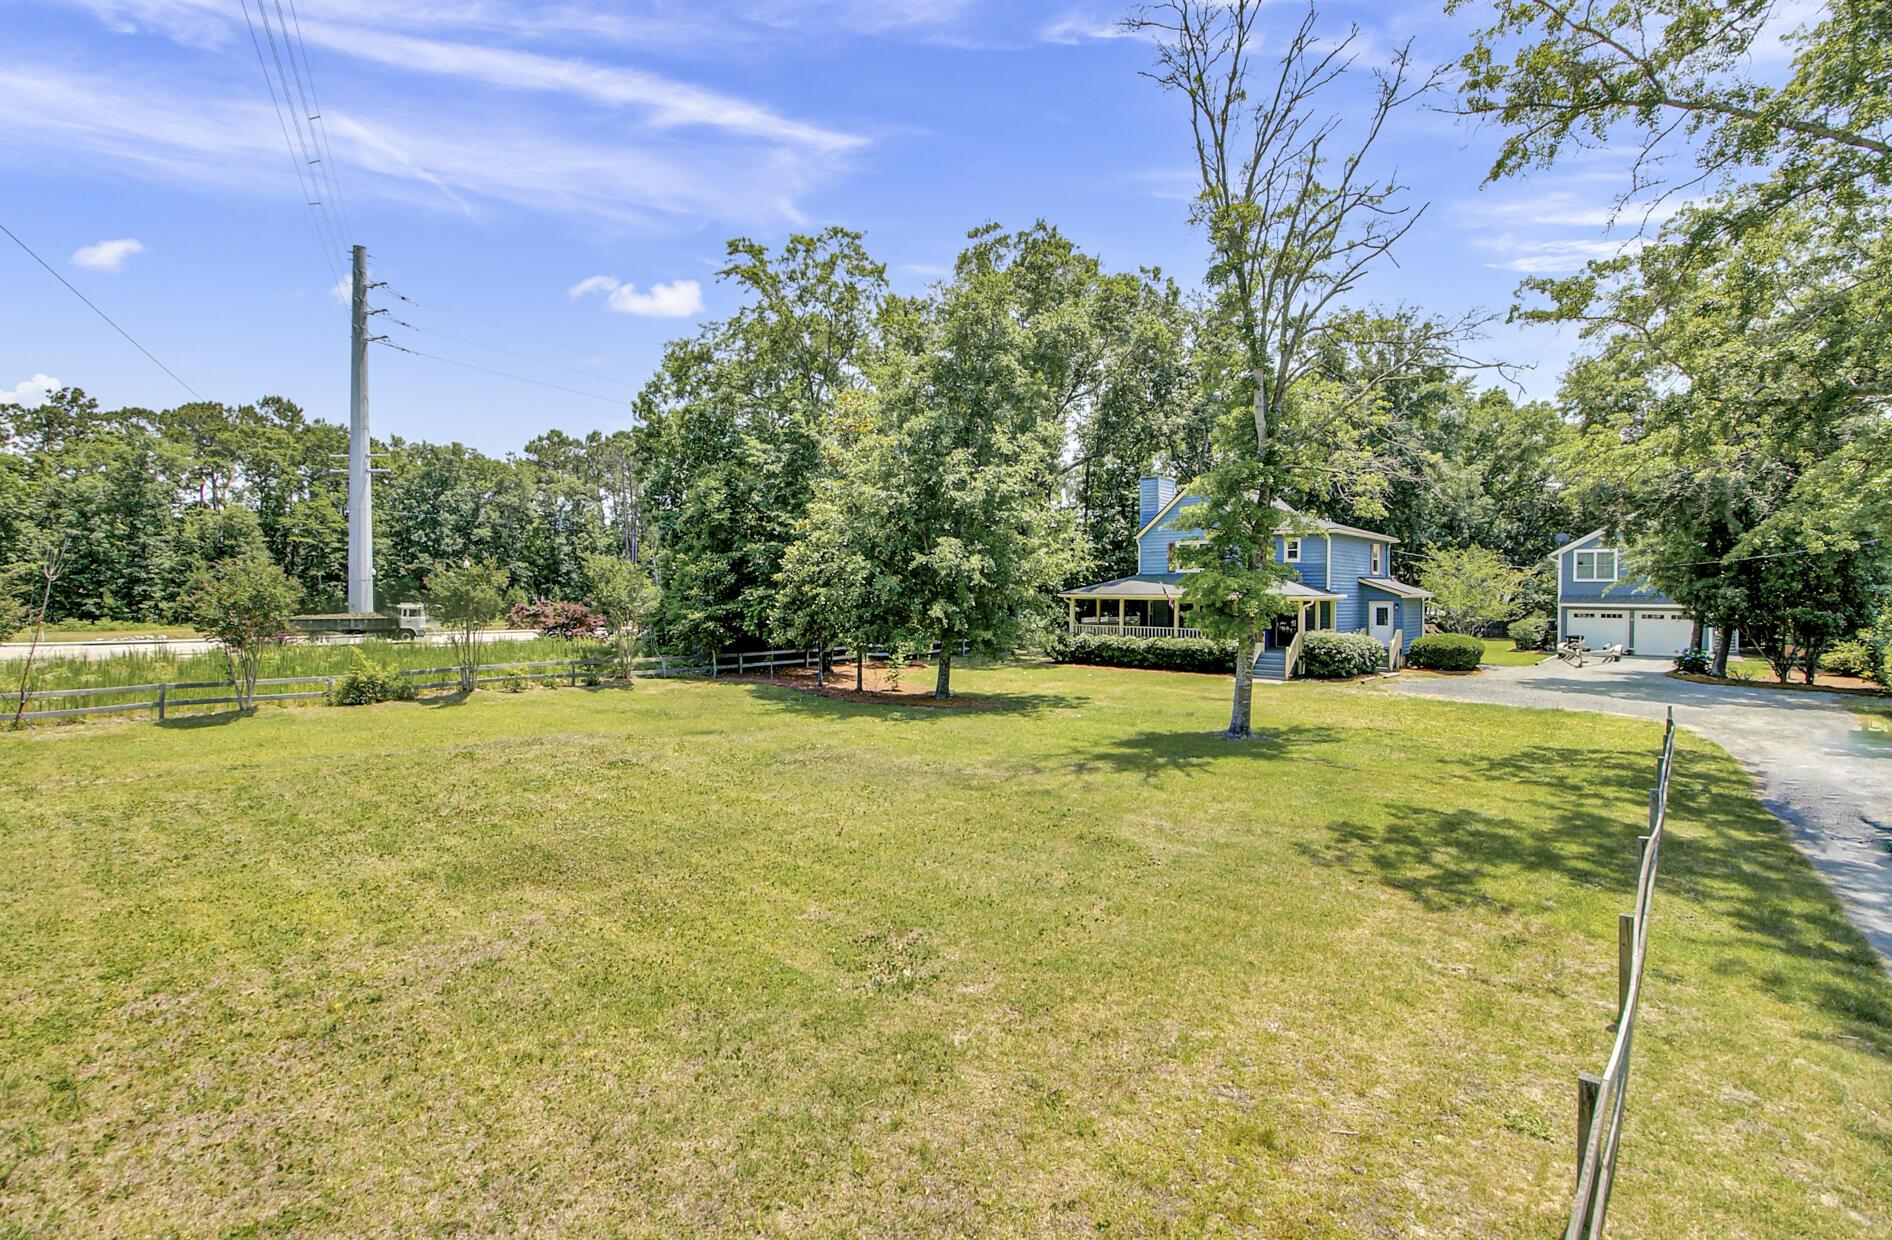 Yaugh Hall Homes For Sale - 1229 Porchers Bluff, Mount Pleasant, SC - 28